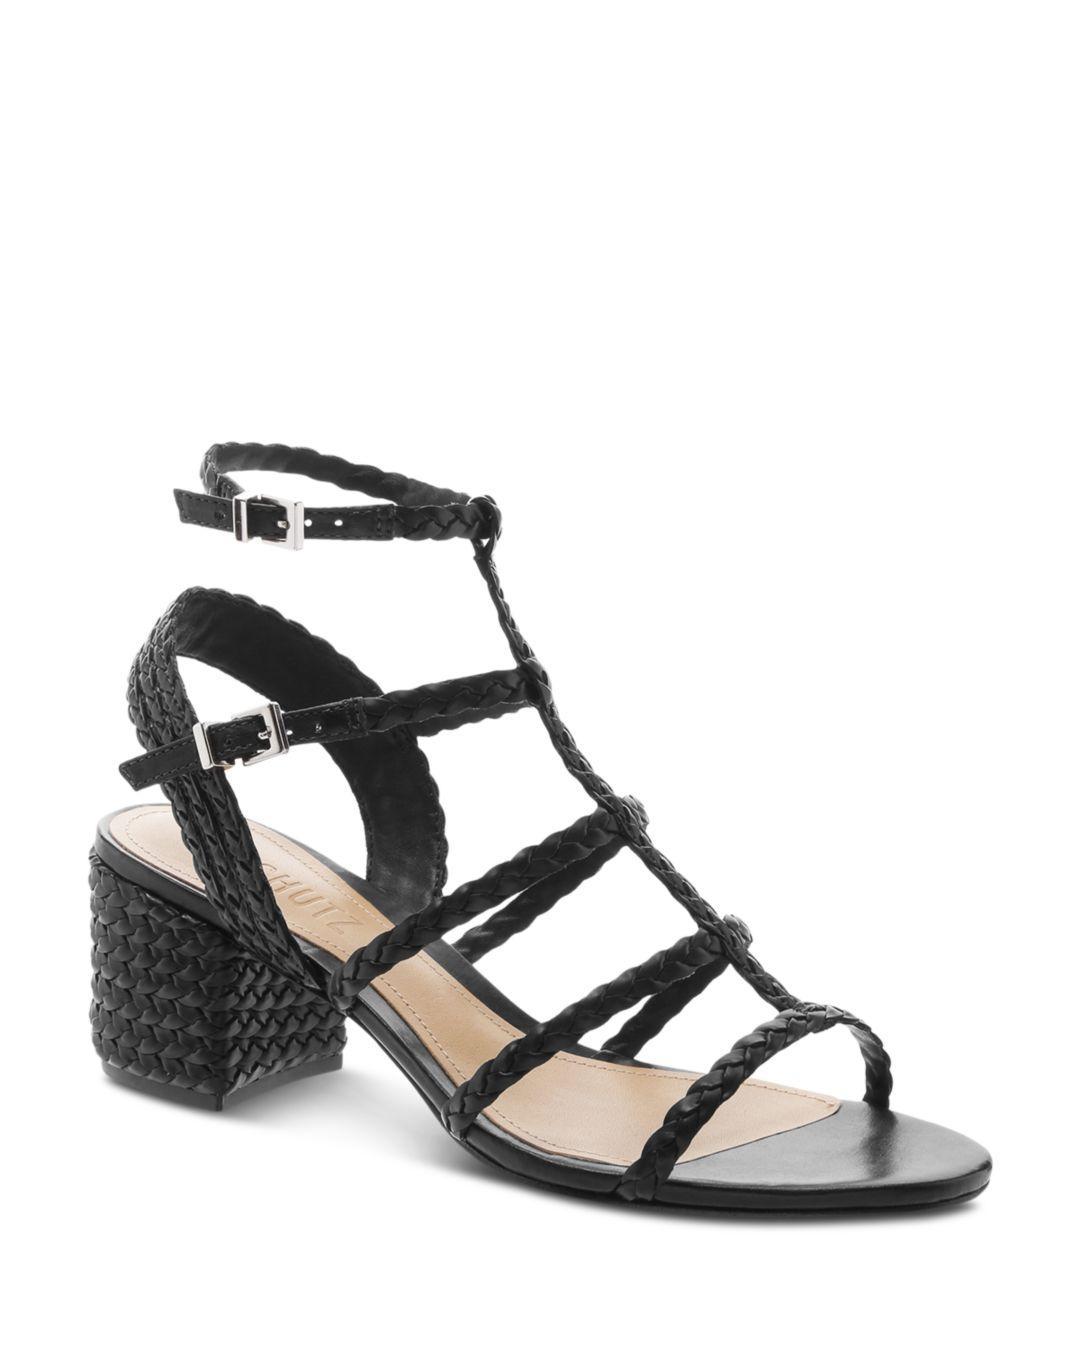 8239073363 Schutz Rosalia Braided Leather Caged Sandals in Black - Save 28% - Lyst